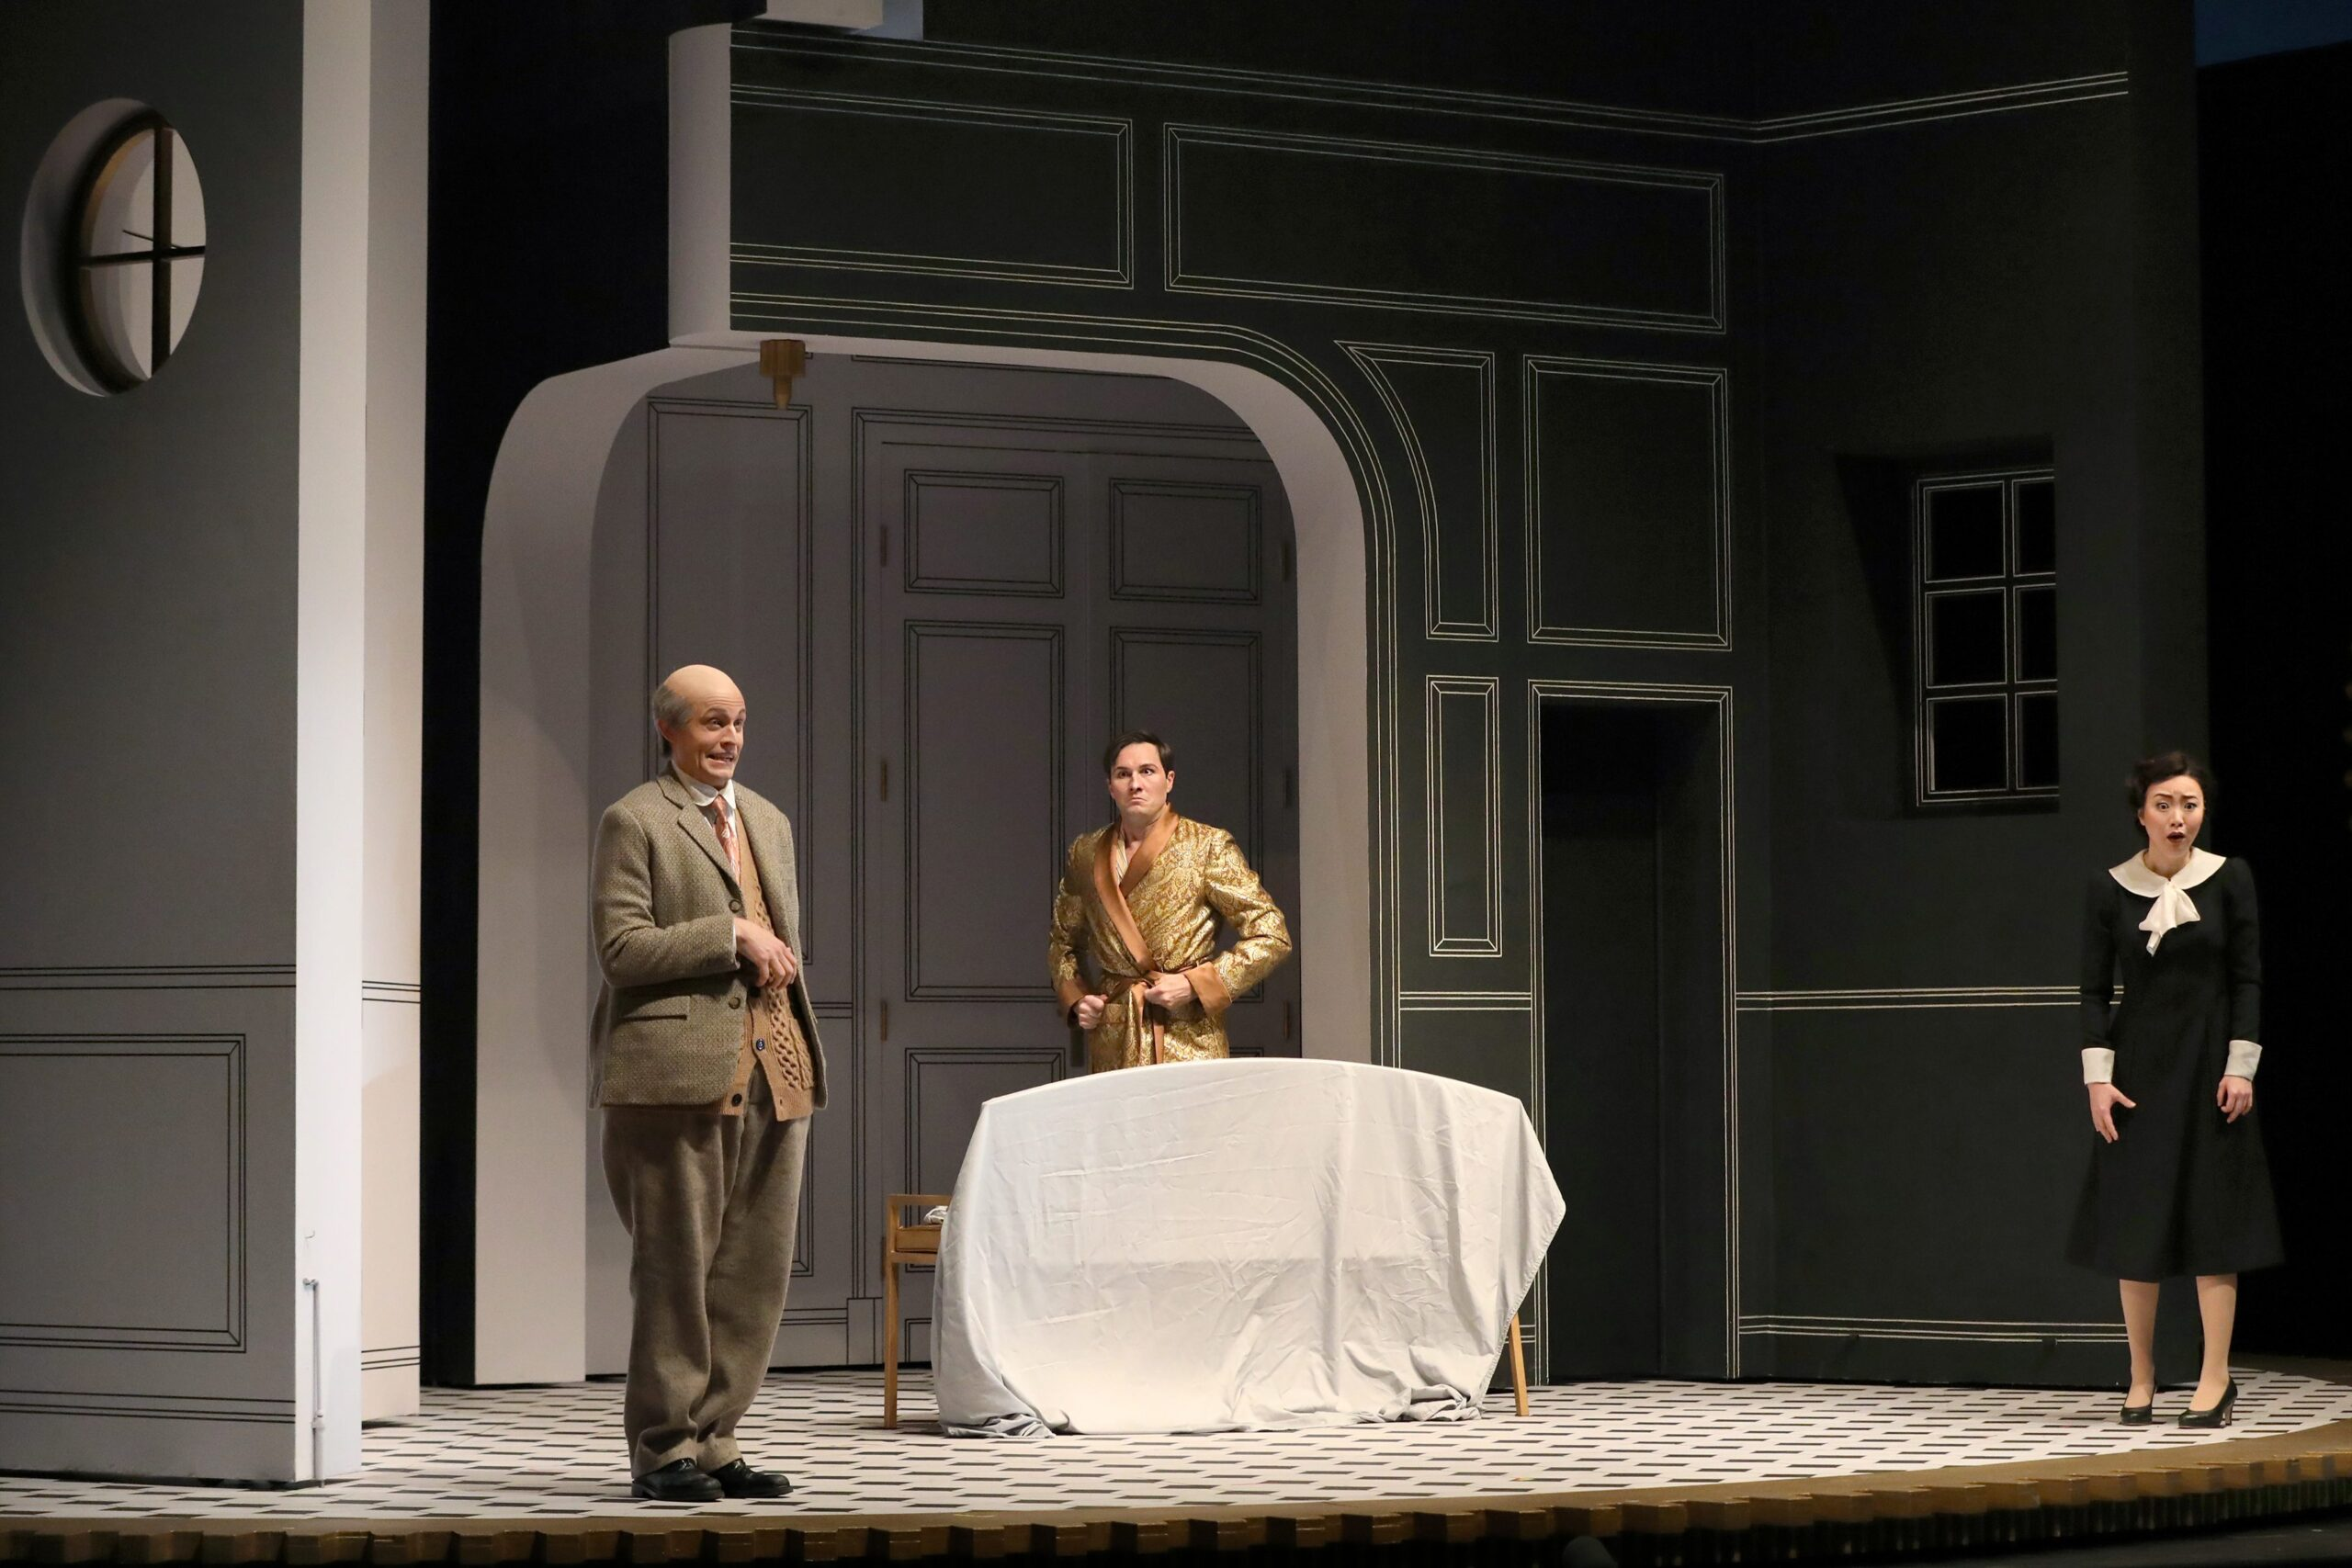 Brenton Ryan (Don Basilio), Samuel Dale Johnson (Count Almaviva), Ying Fang (Susanna). Photo Credit: Curtis Brown For The Santa Fe Opera, 2021